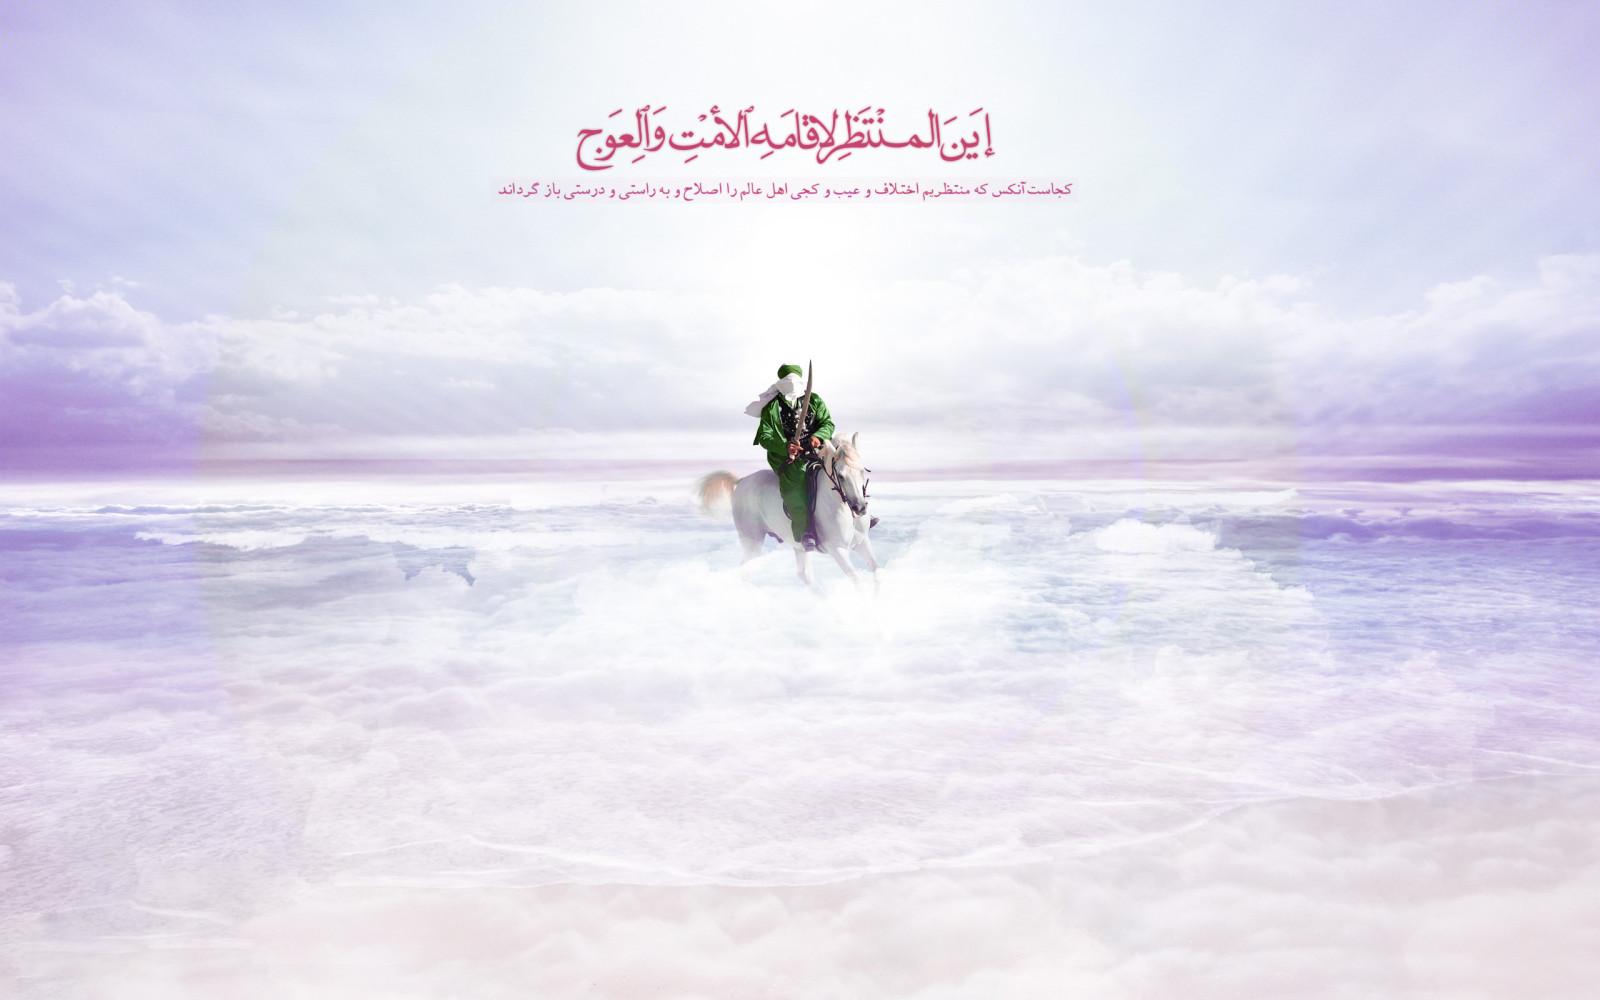 http://dl.aviny.com/Album/mazhabi/ahlbeit/mahdi/kamel/204.jpg